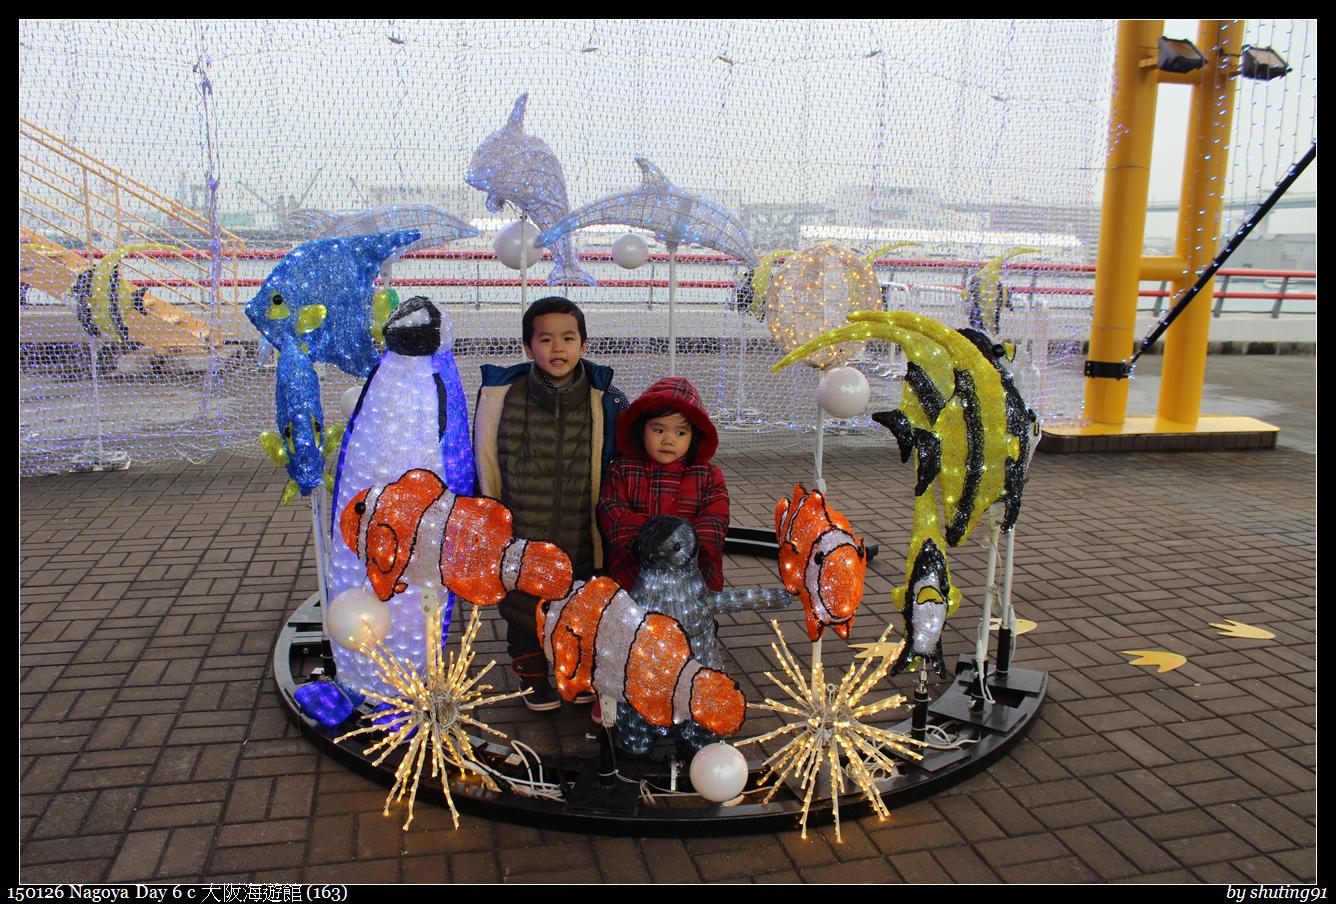 150126 Nagoya Day 6 c 大阪海遊館 (163).jpg